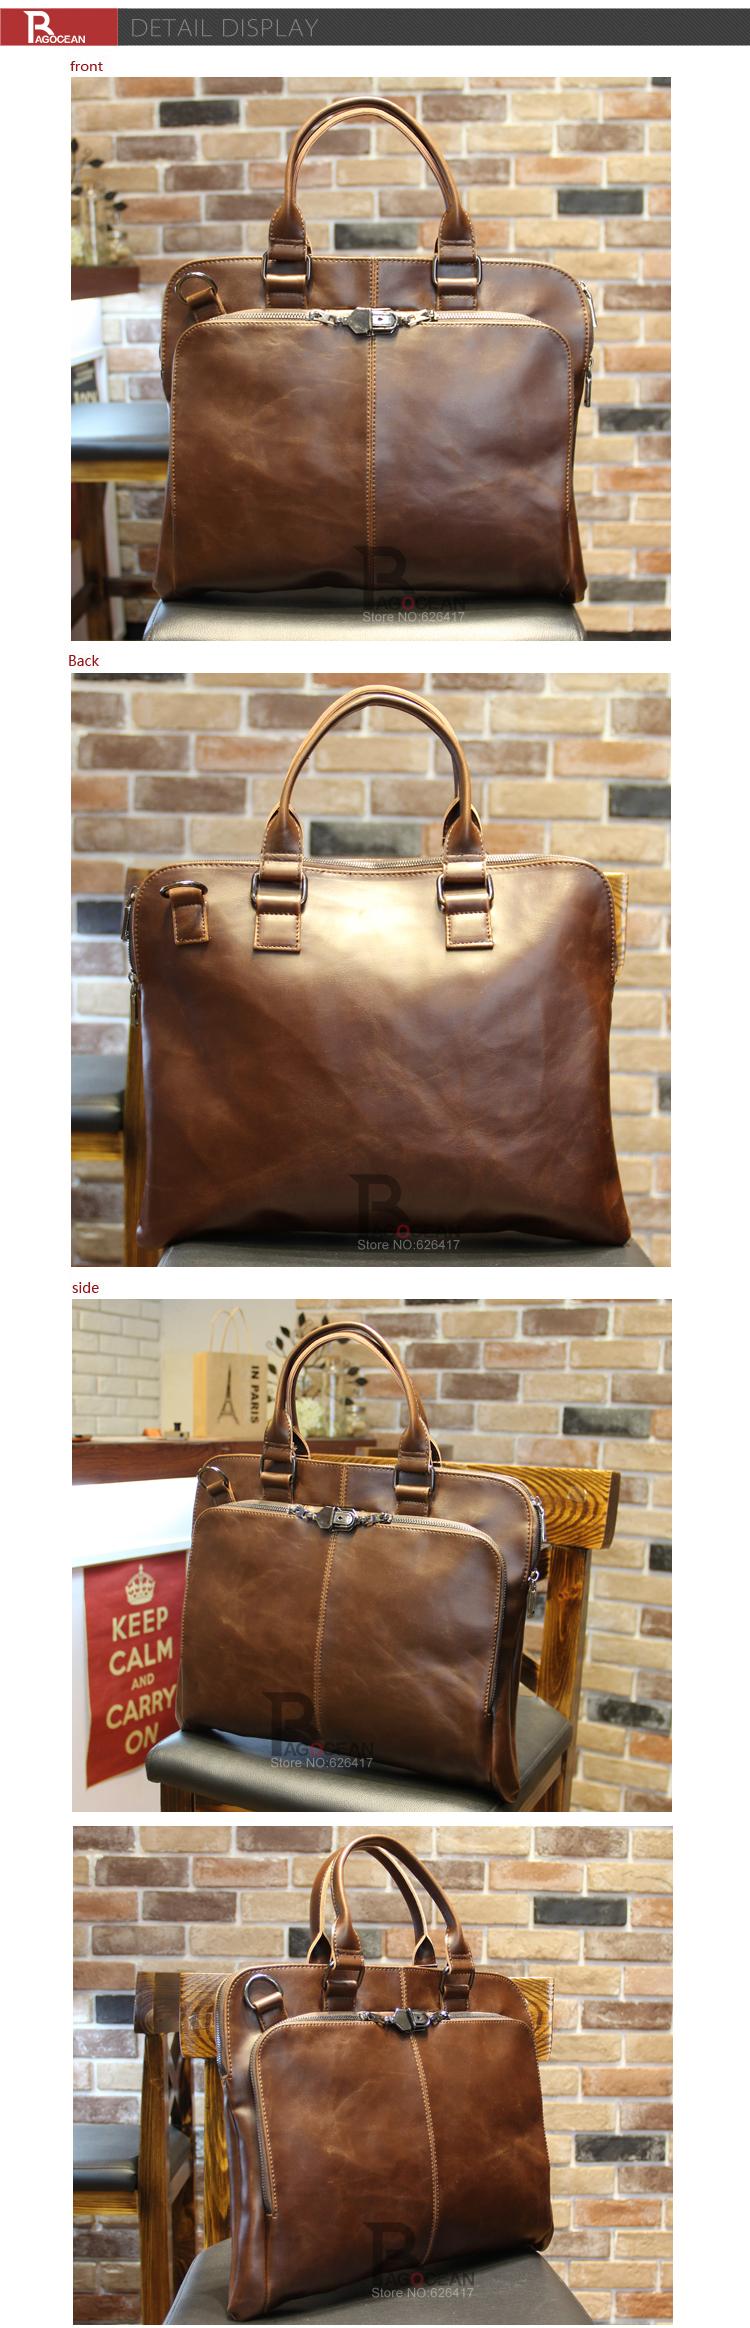 "New high quality pu leather Shoulder leisure men's bag business messenger portable briefcase Laptop large Purse 14"" Handbag 10"